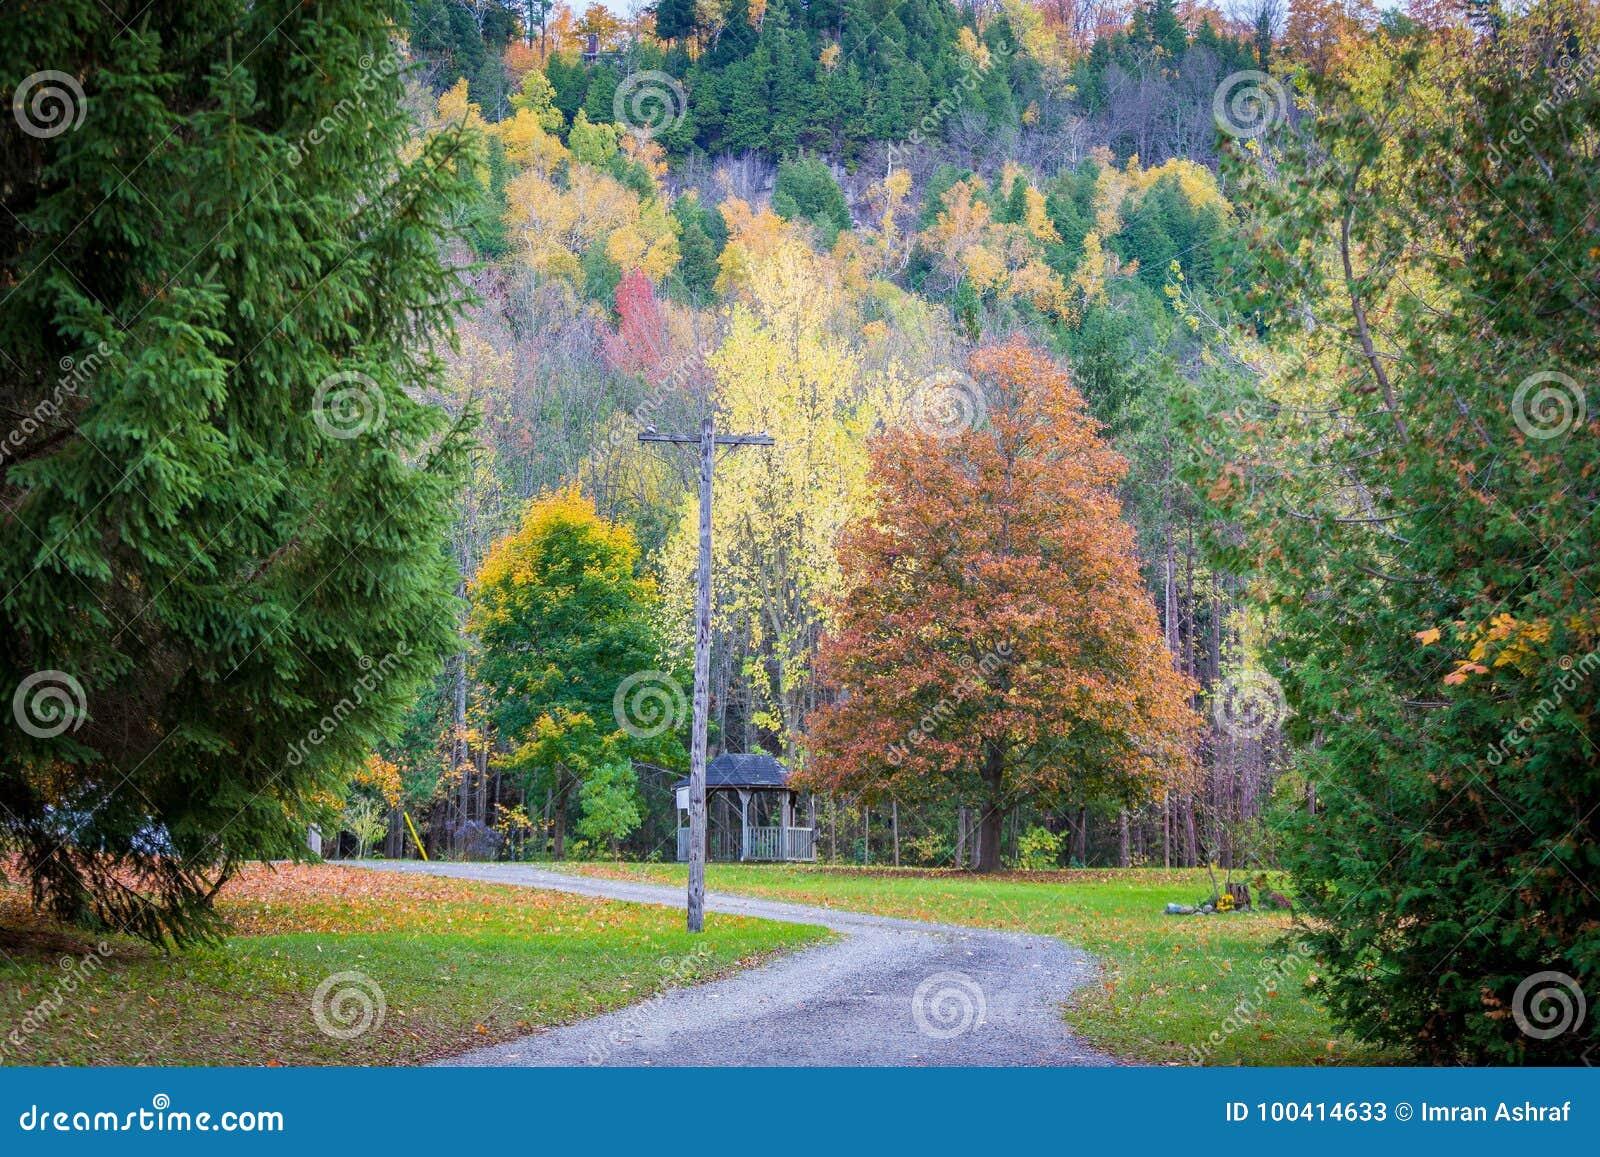 Beautiful fall trees stock image. Image of nature, landscape - 100414633